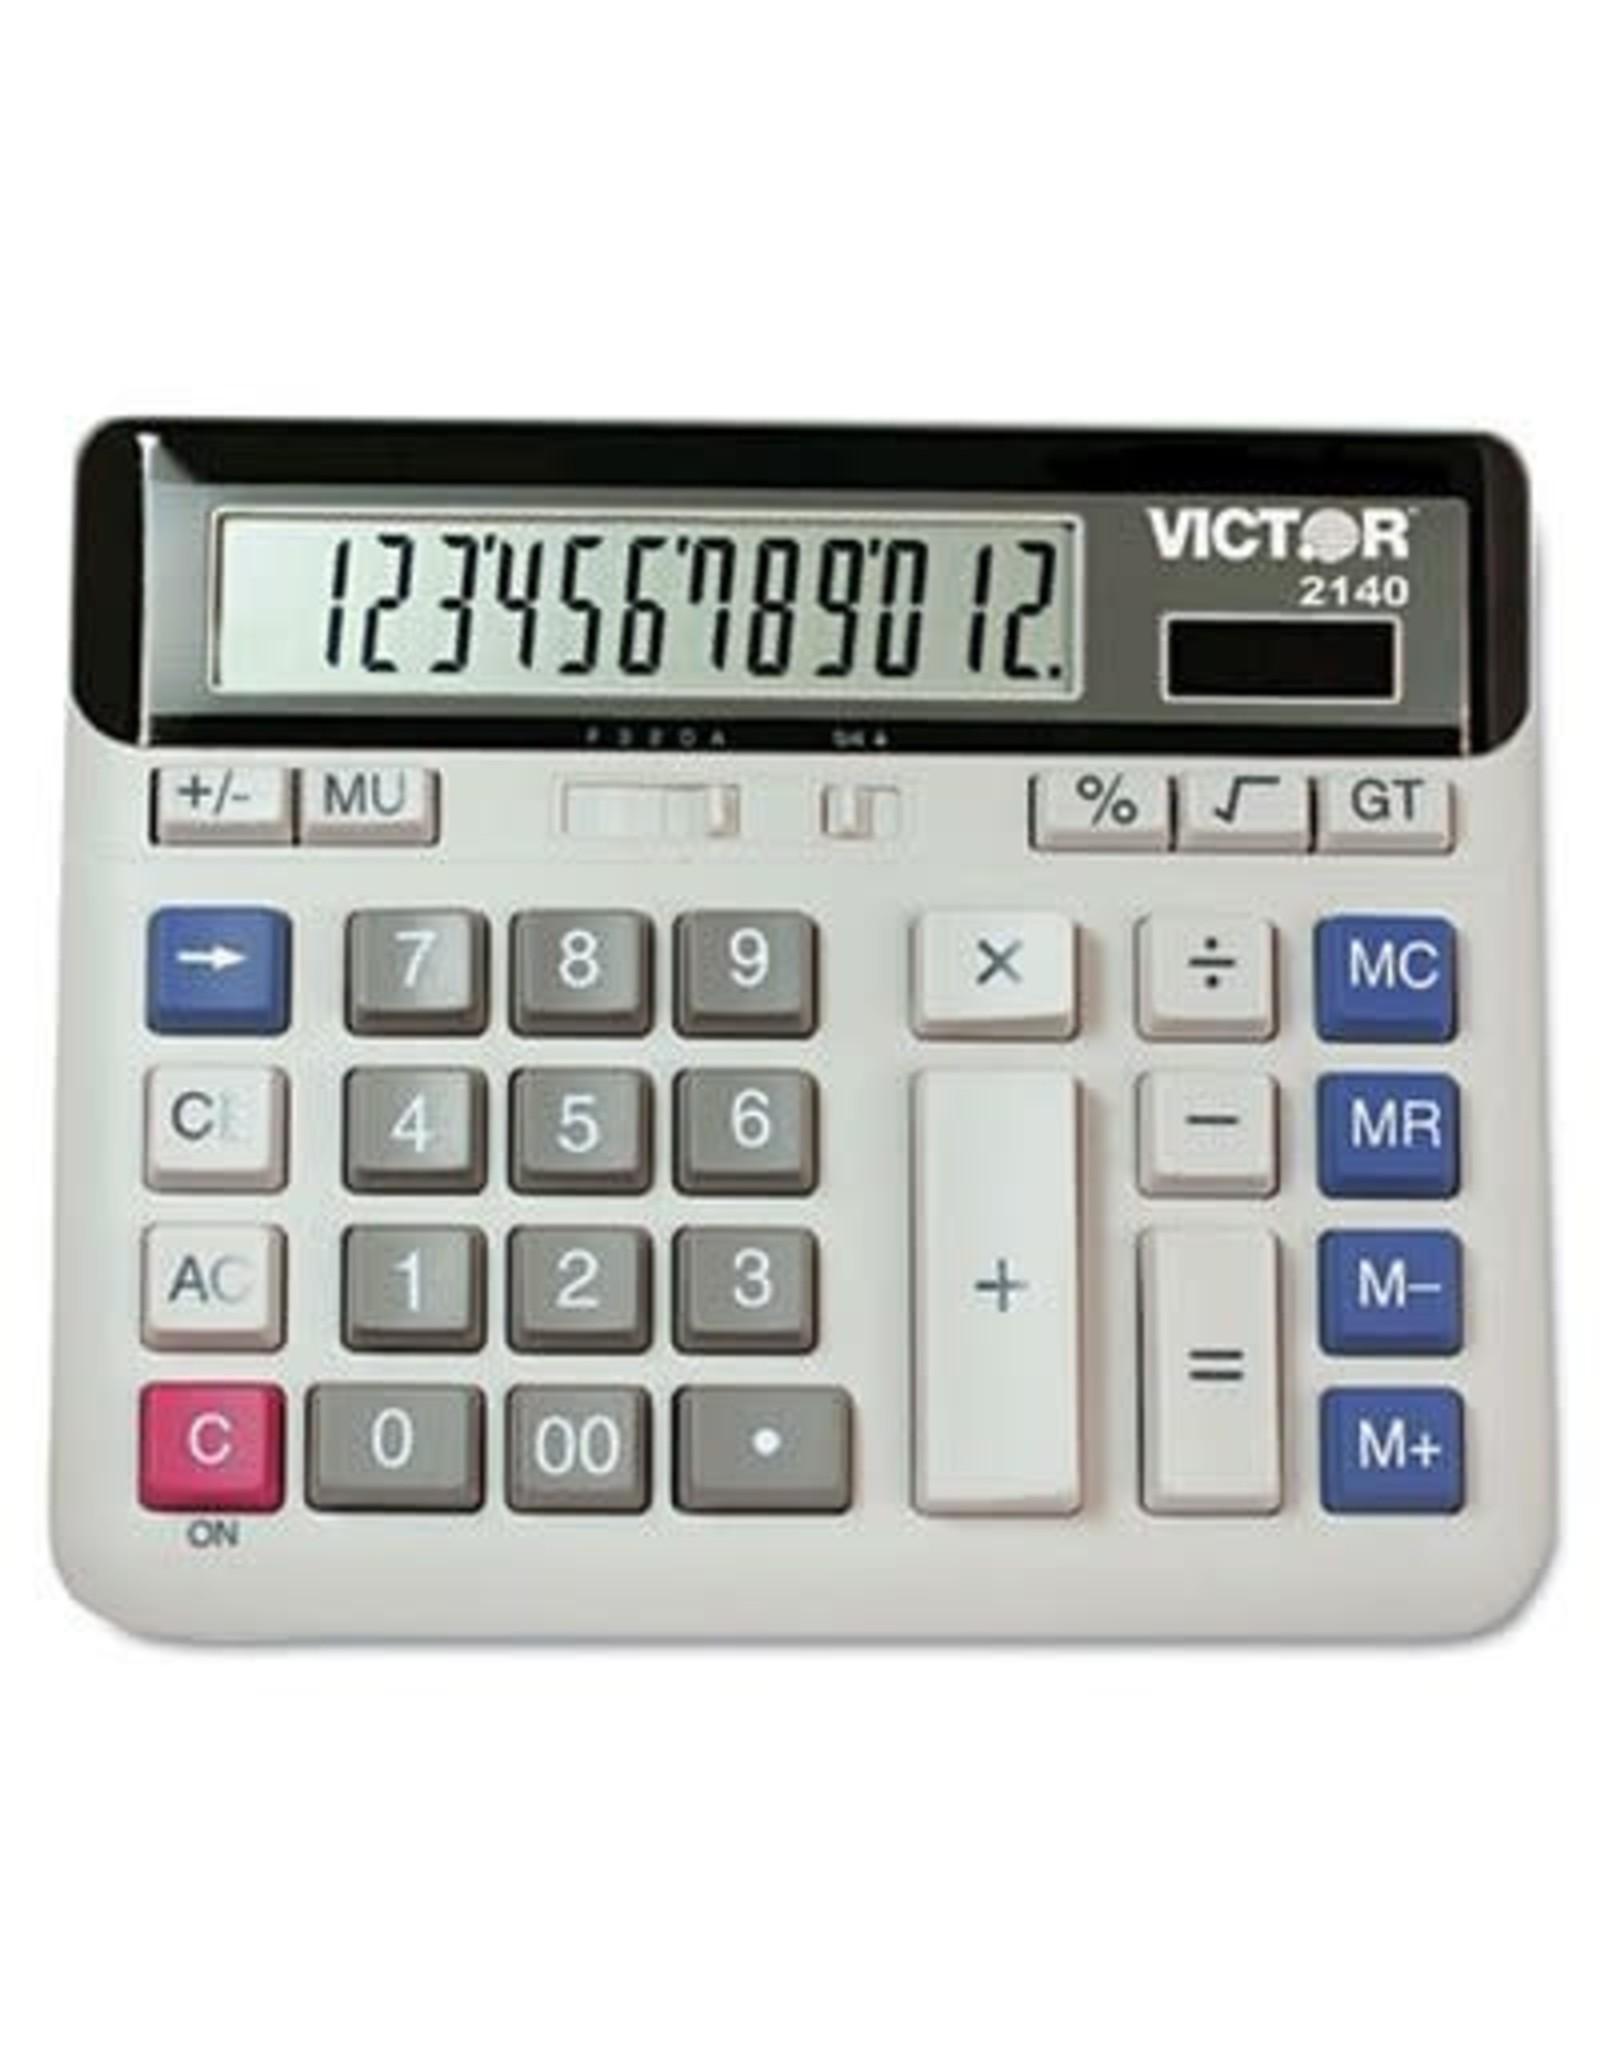 Victor Technology CALCULATOR-DESKTOP SOLAR/BATTERY 12 DIGIT ANGLED DISPLAY